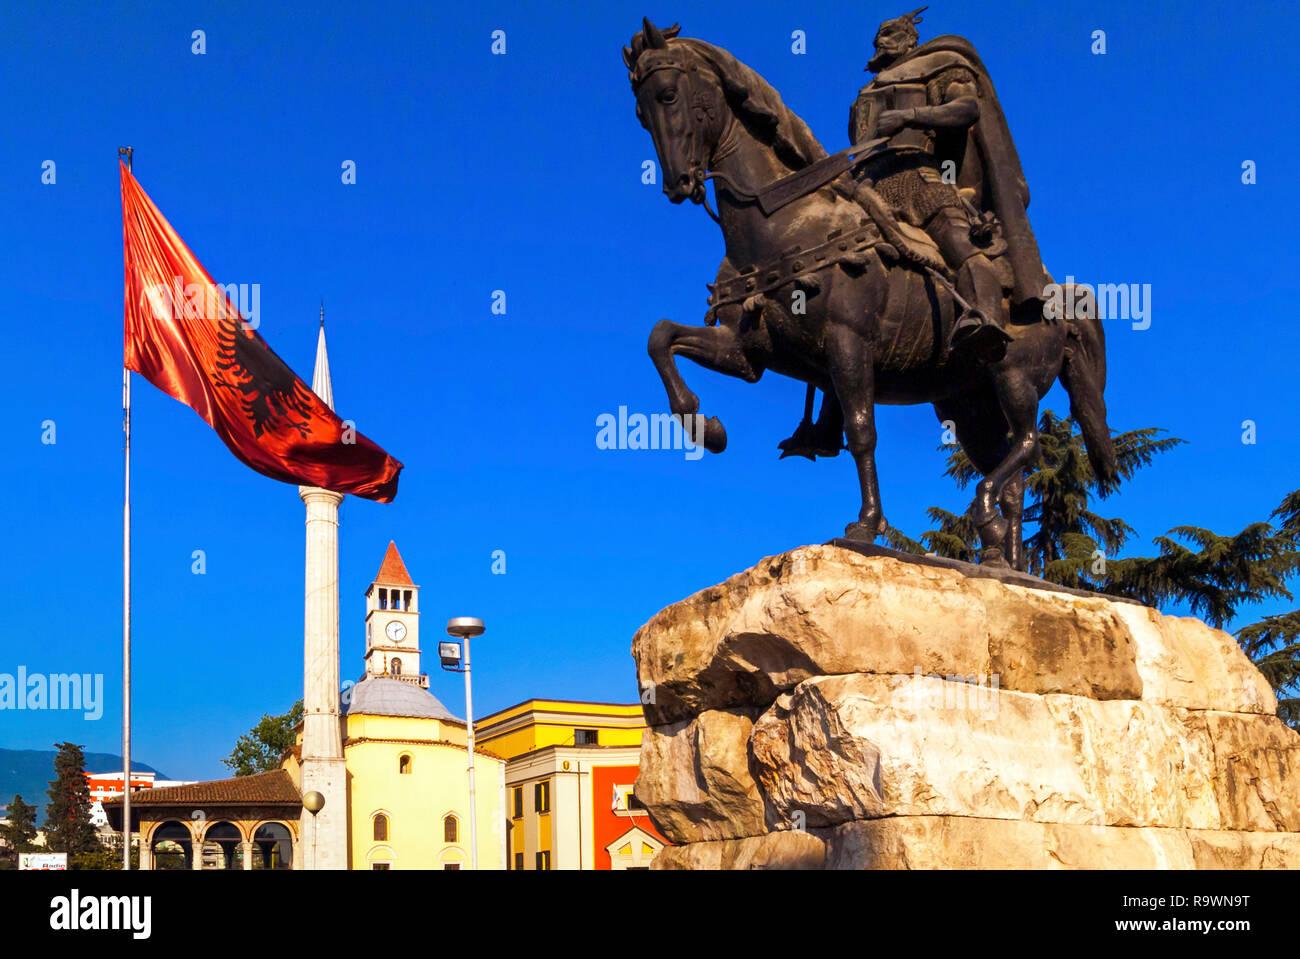 Skanderberg Equestrian Statue, Ethem Bay mosque, Clock Tower and Square, Tirana, Albania - Stock Image